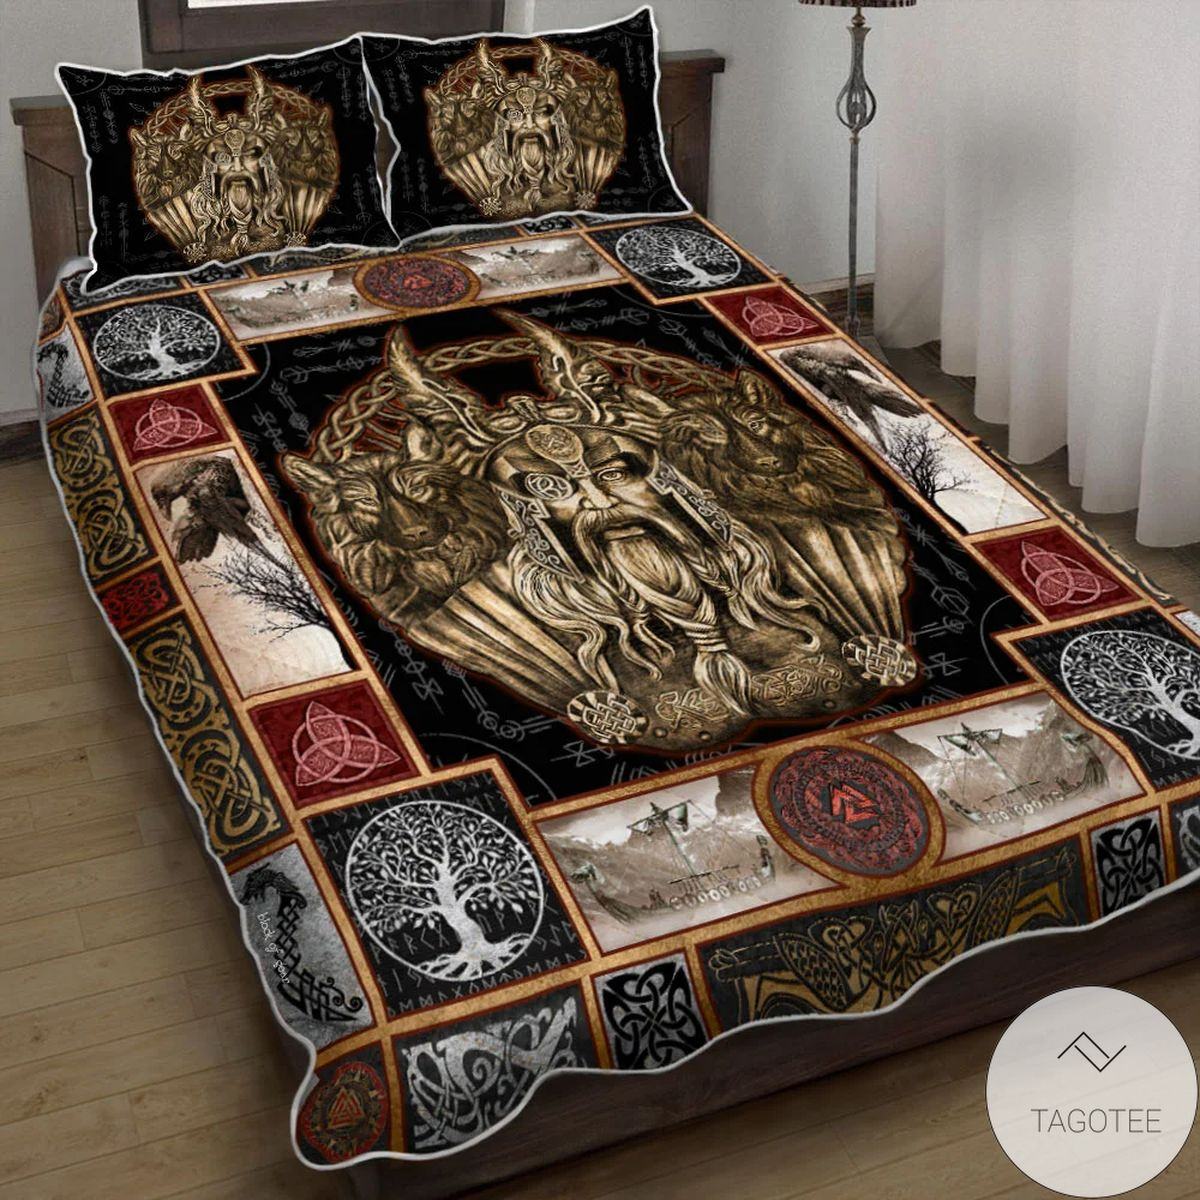 Ancient Treasures Geri and Freki Nordic Wolves Quilt Bedding Set